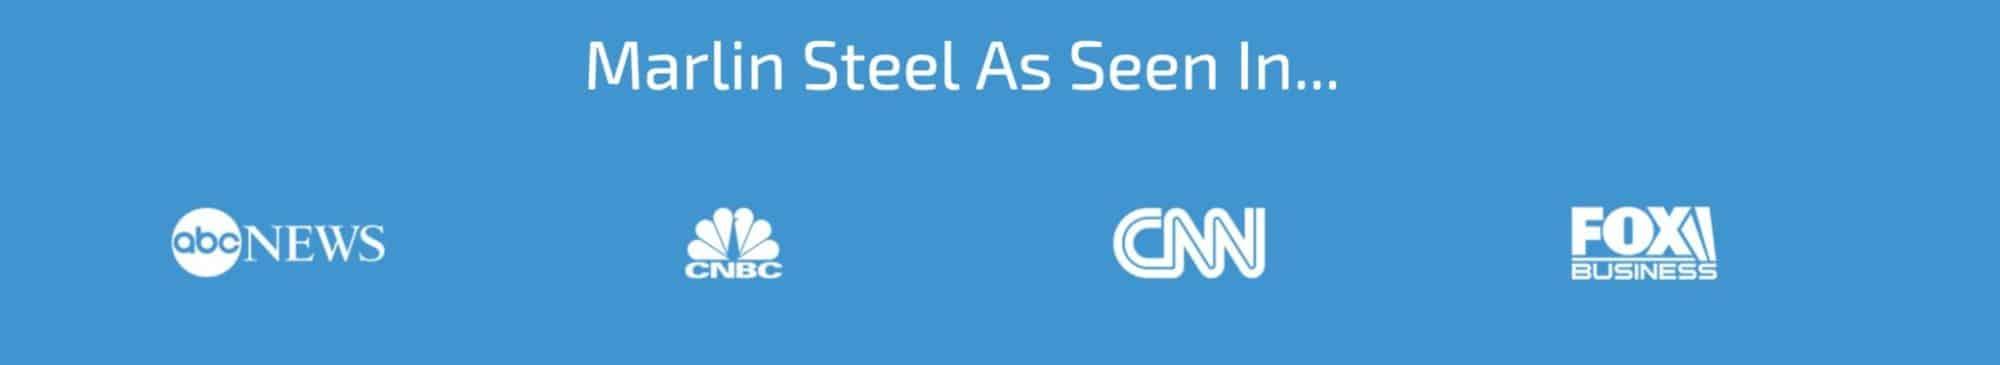 Industrial Machinery- Steel website design